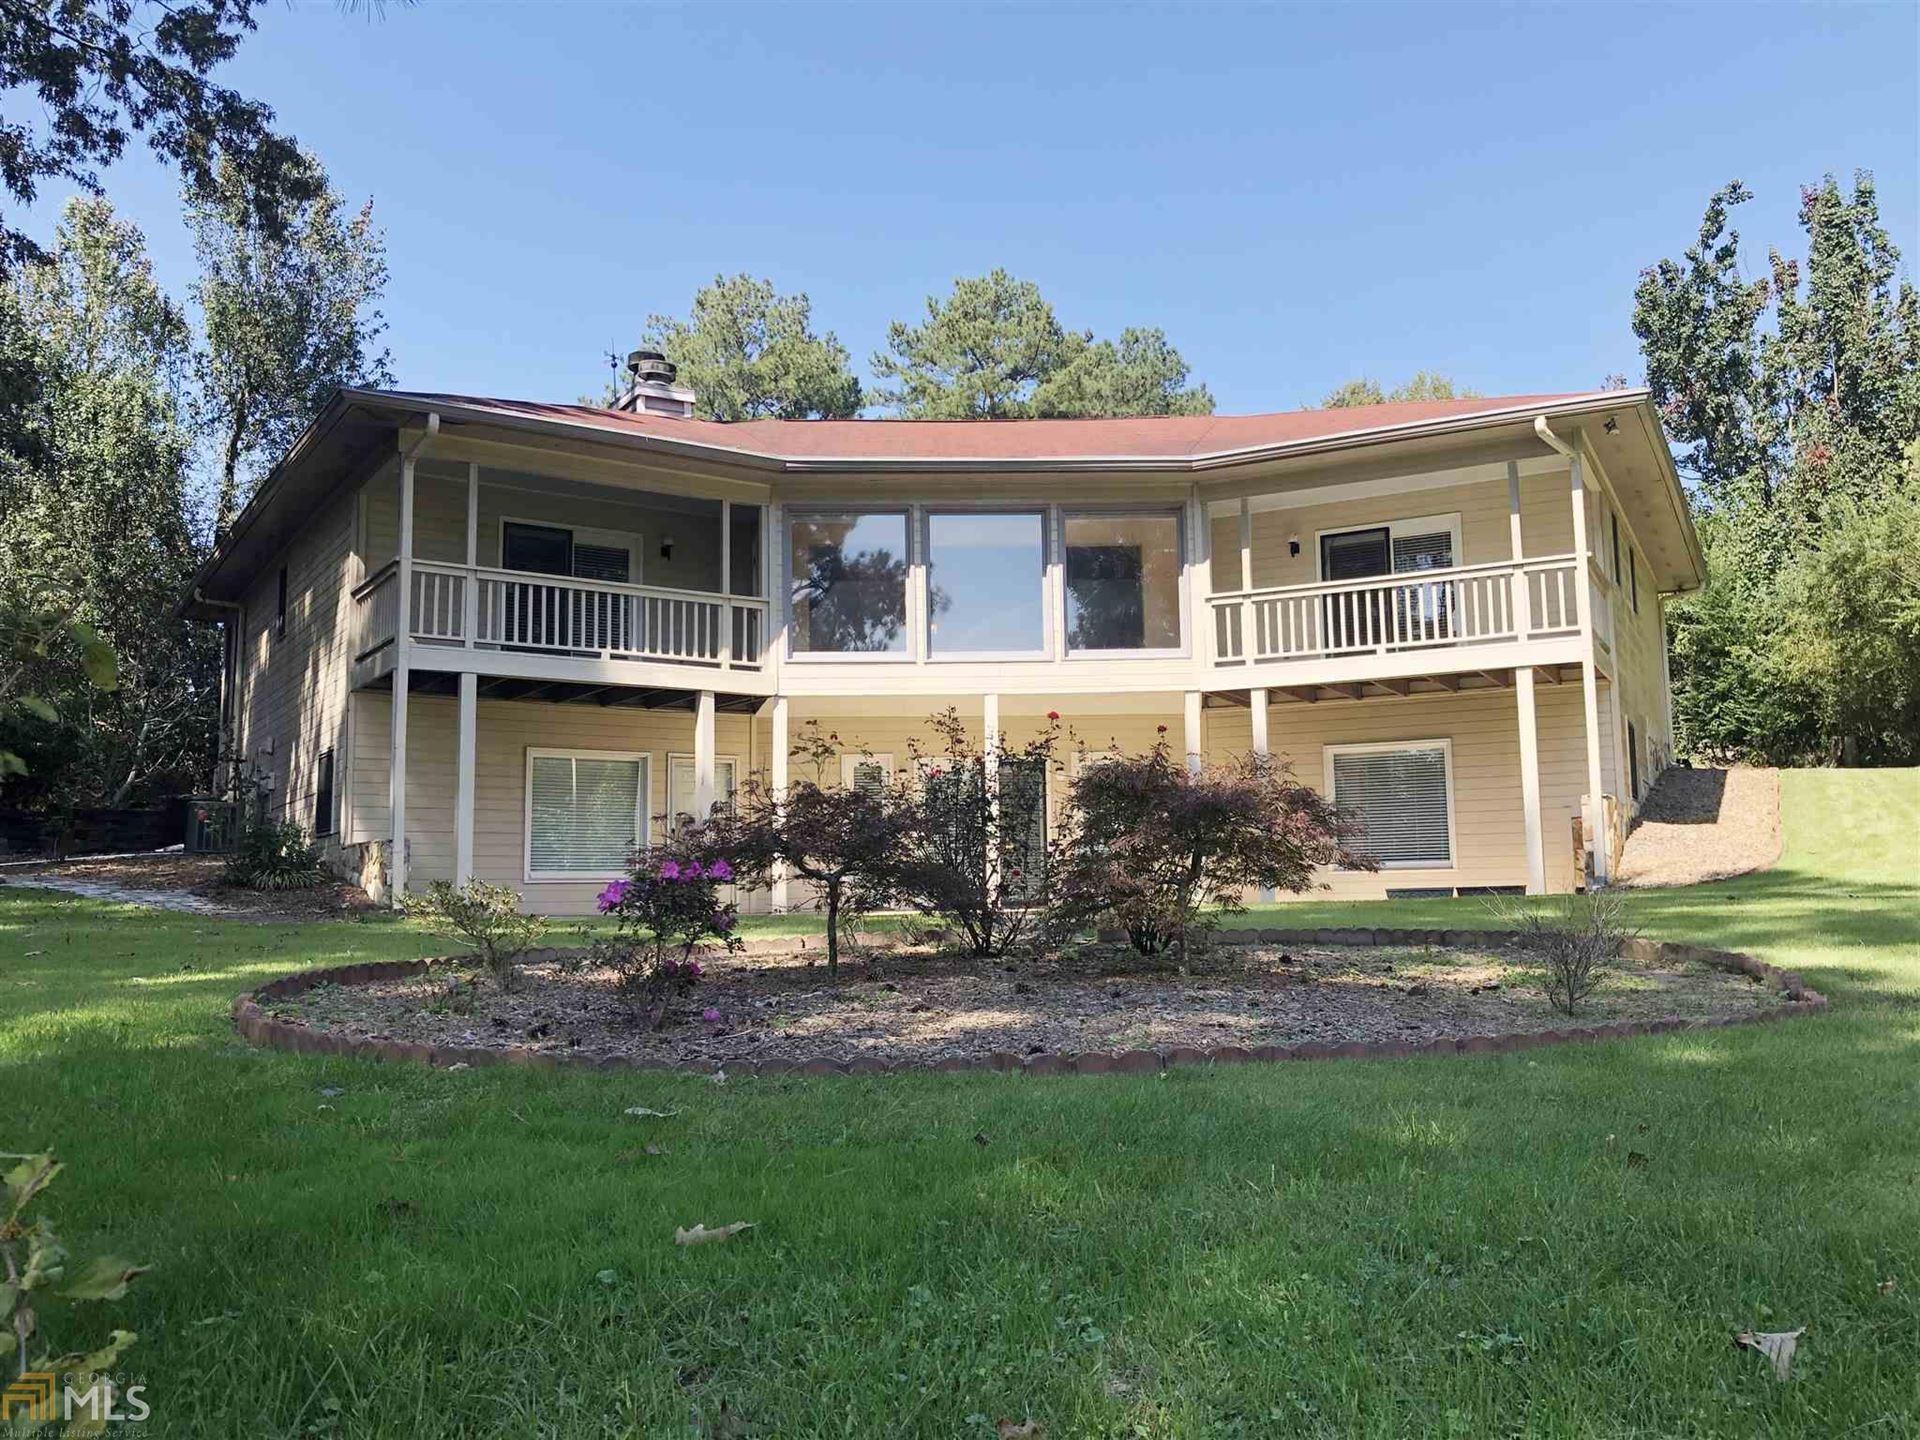 4464 Old Norcross Rd, Duluth, GA 30096 - MLS#: 8869198